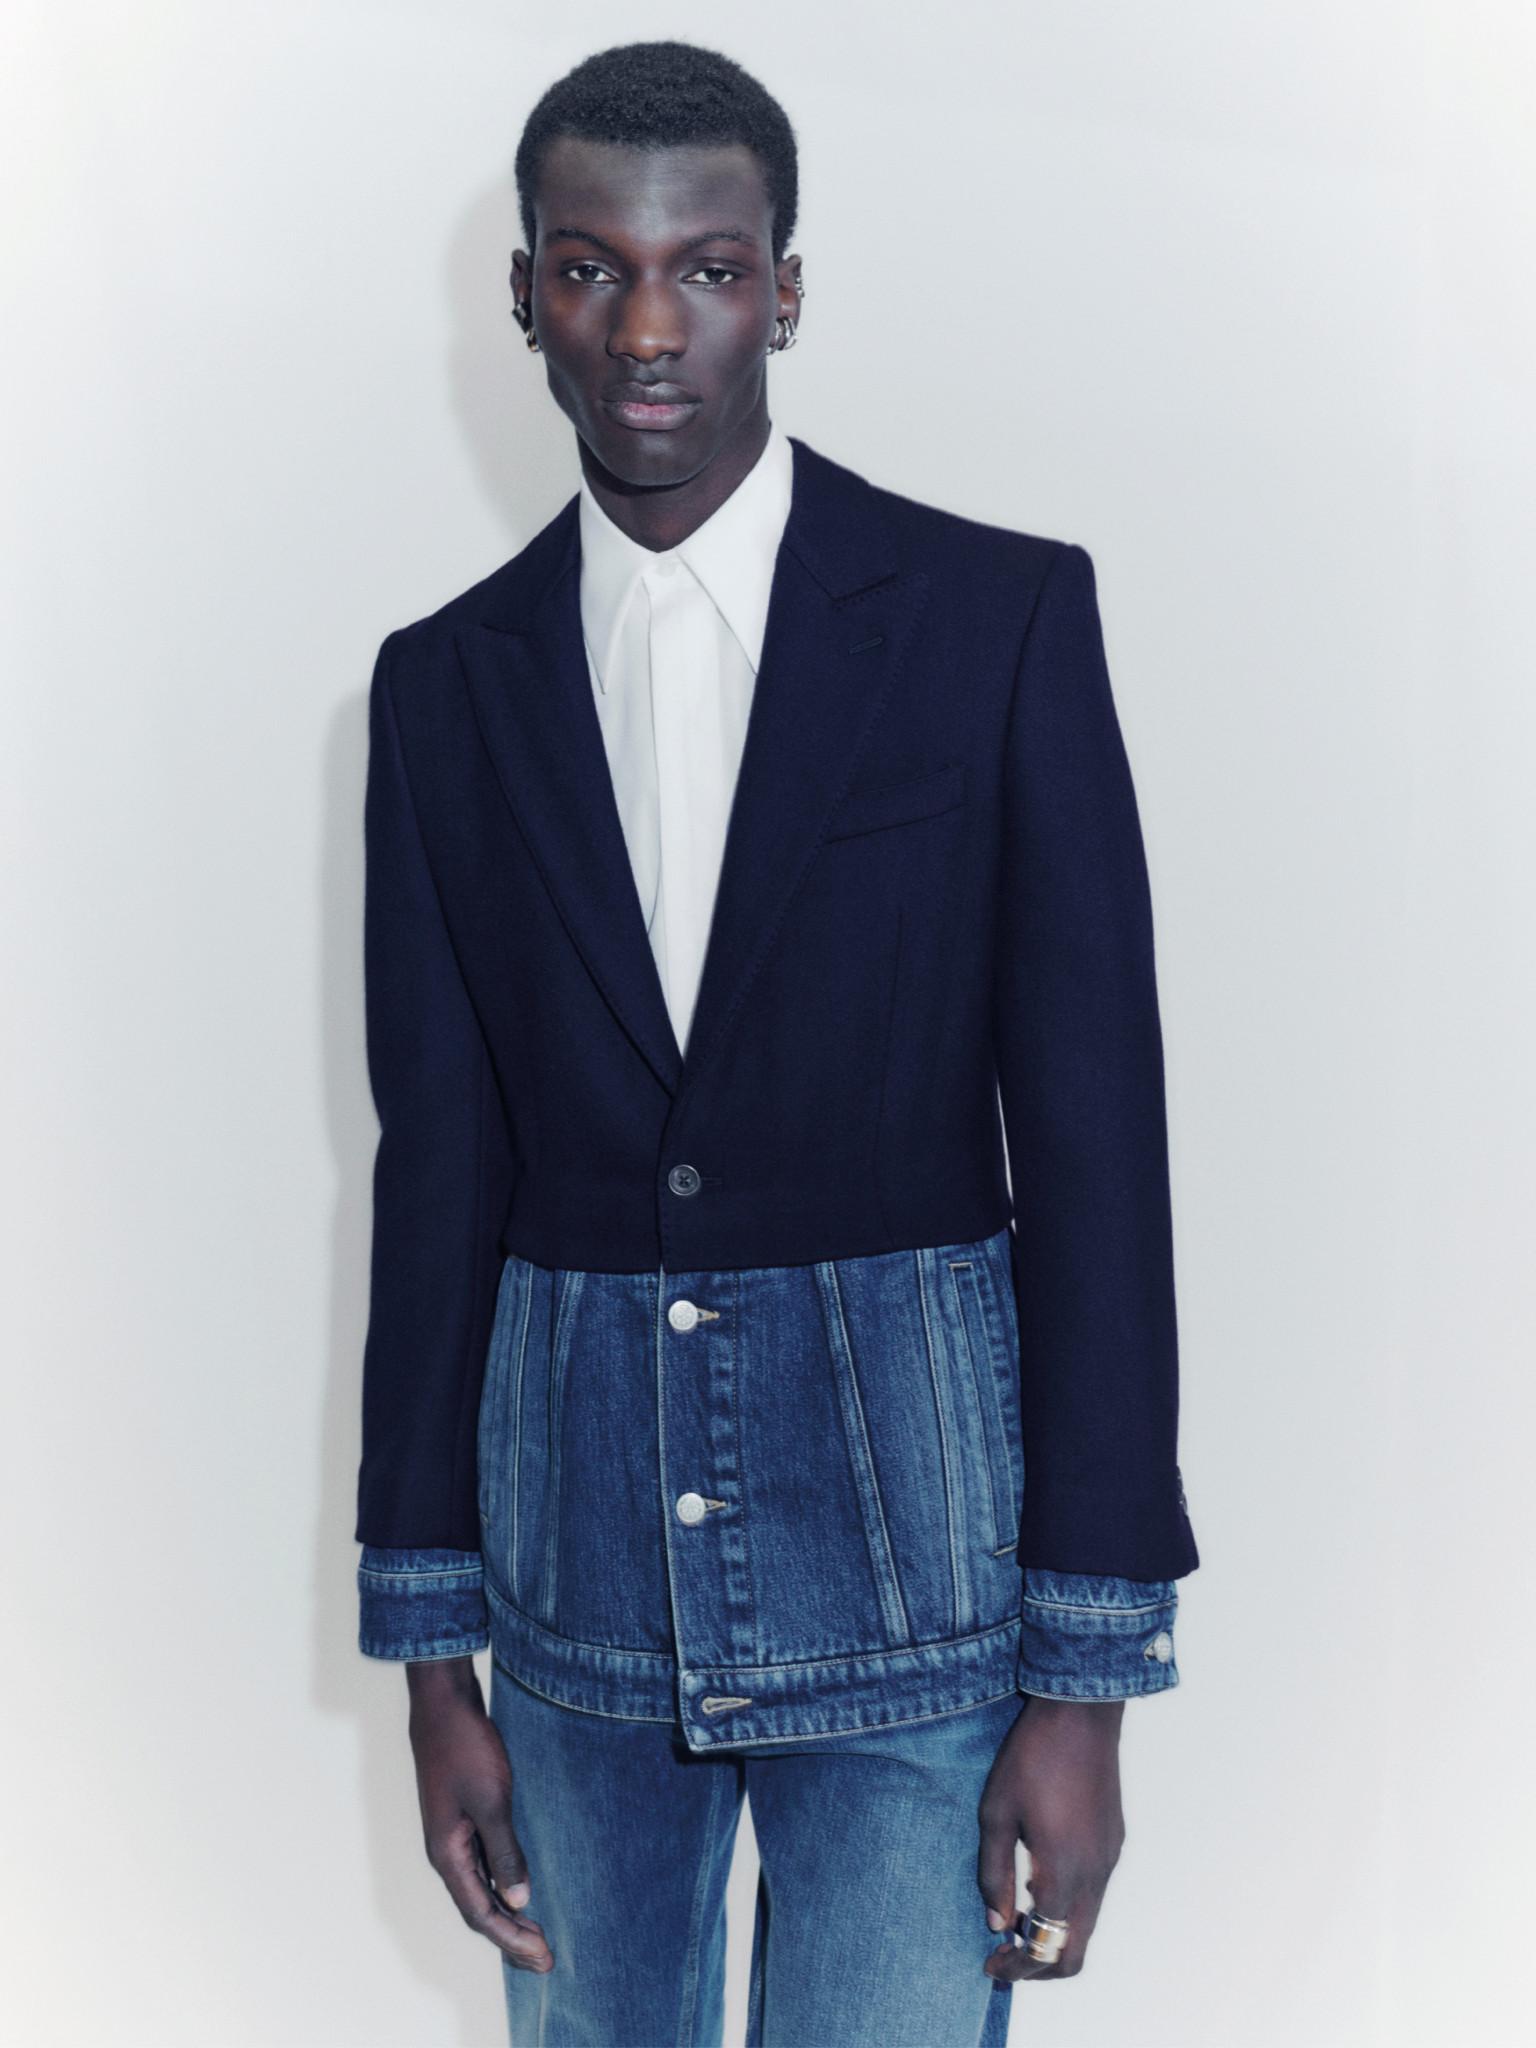 McQueen AW21 Menswear